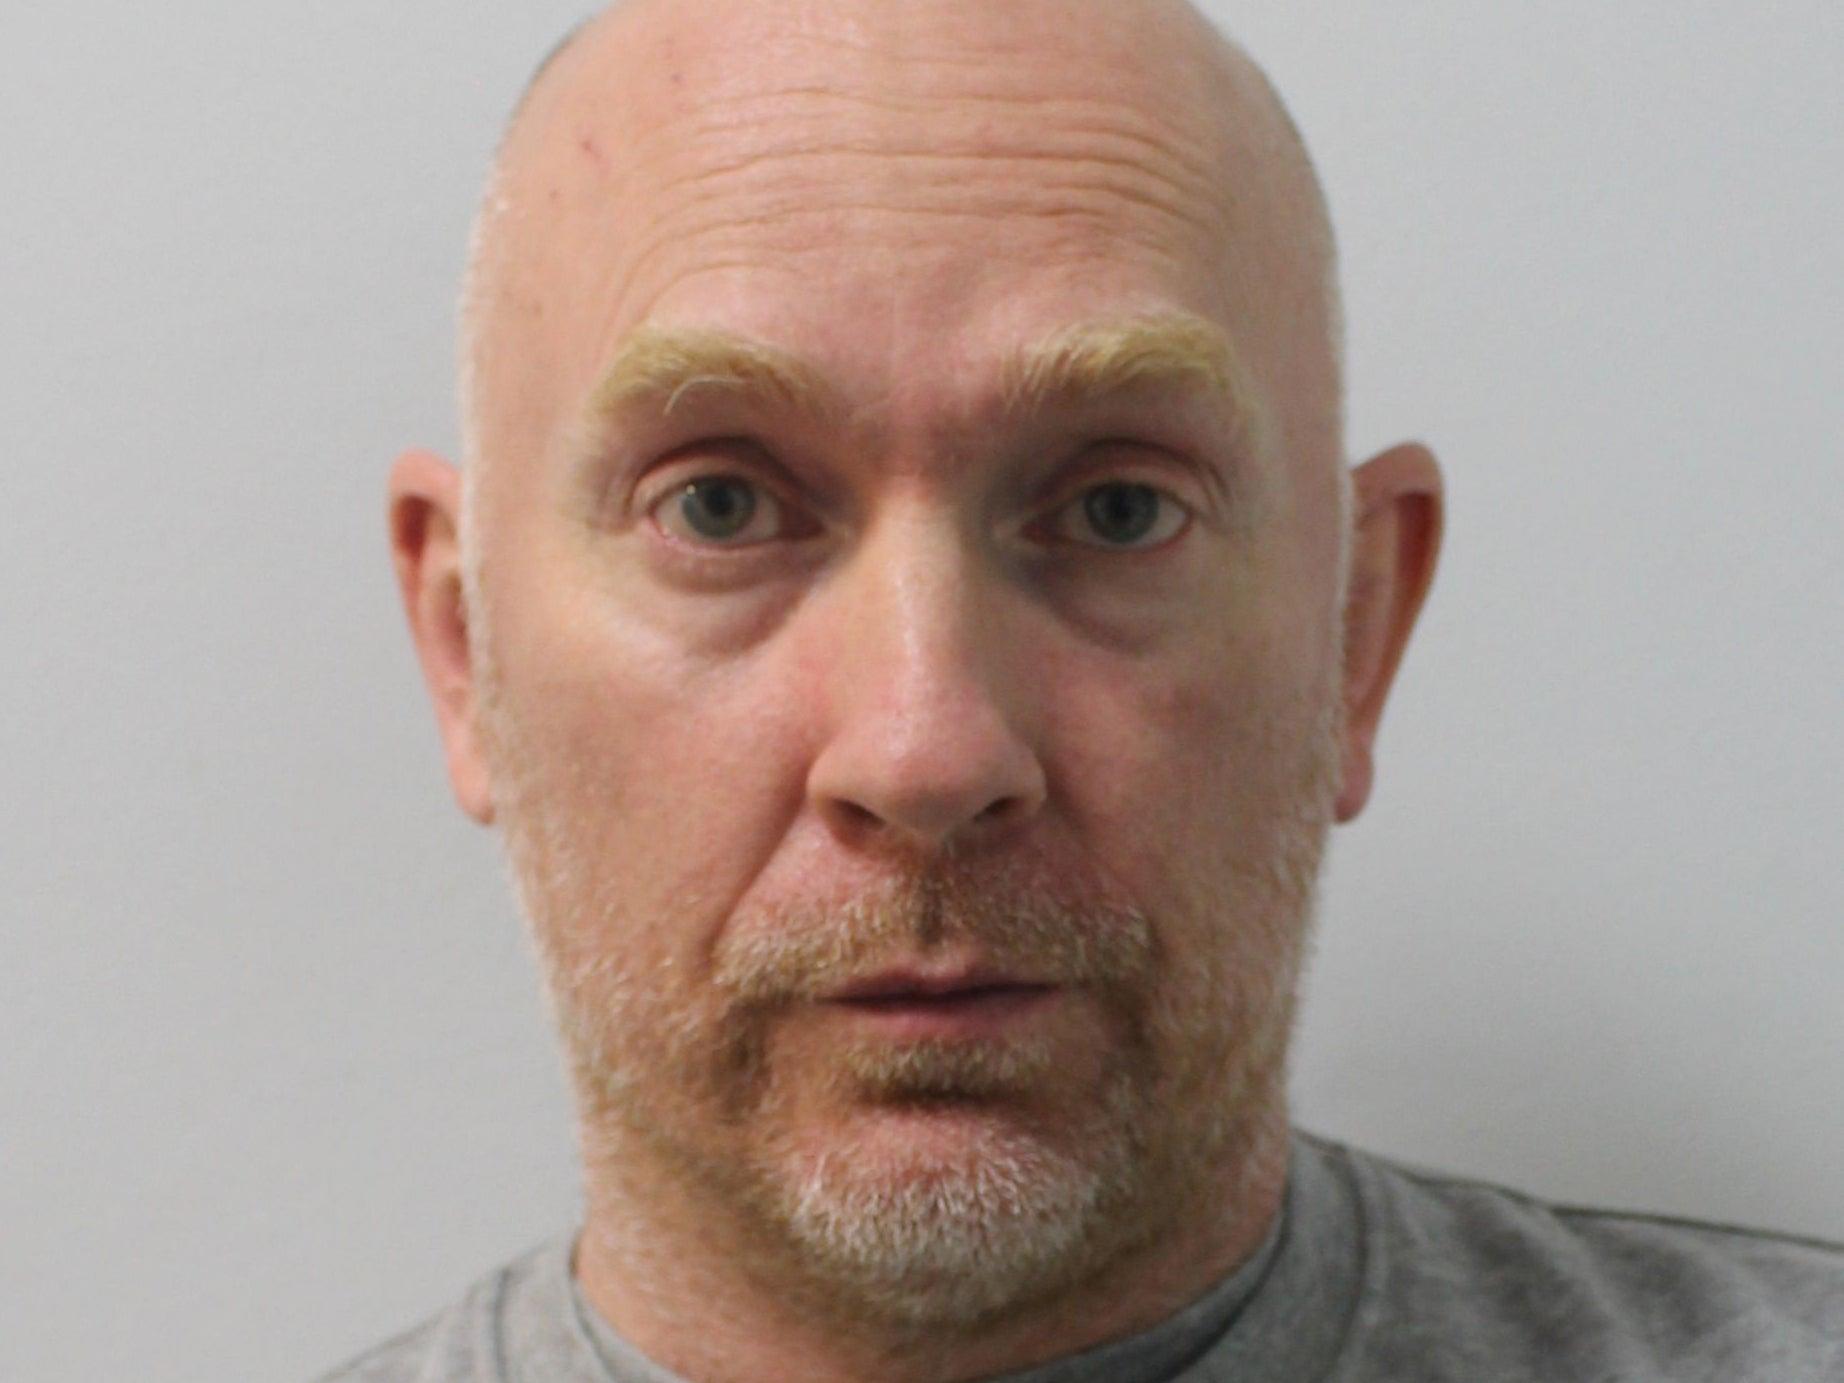 Wayne Couzens Pleaded Guilty Killing of Sarah Everard.